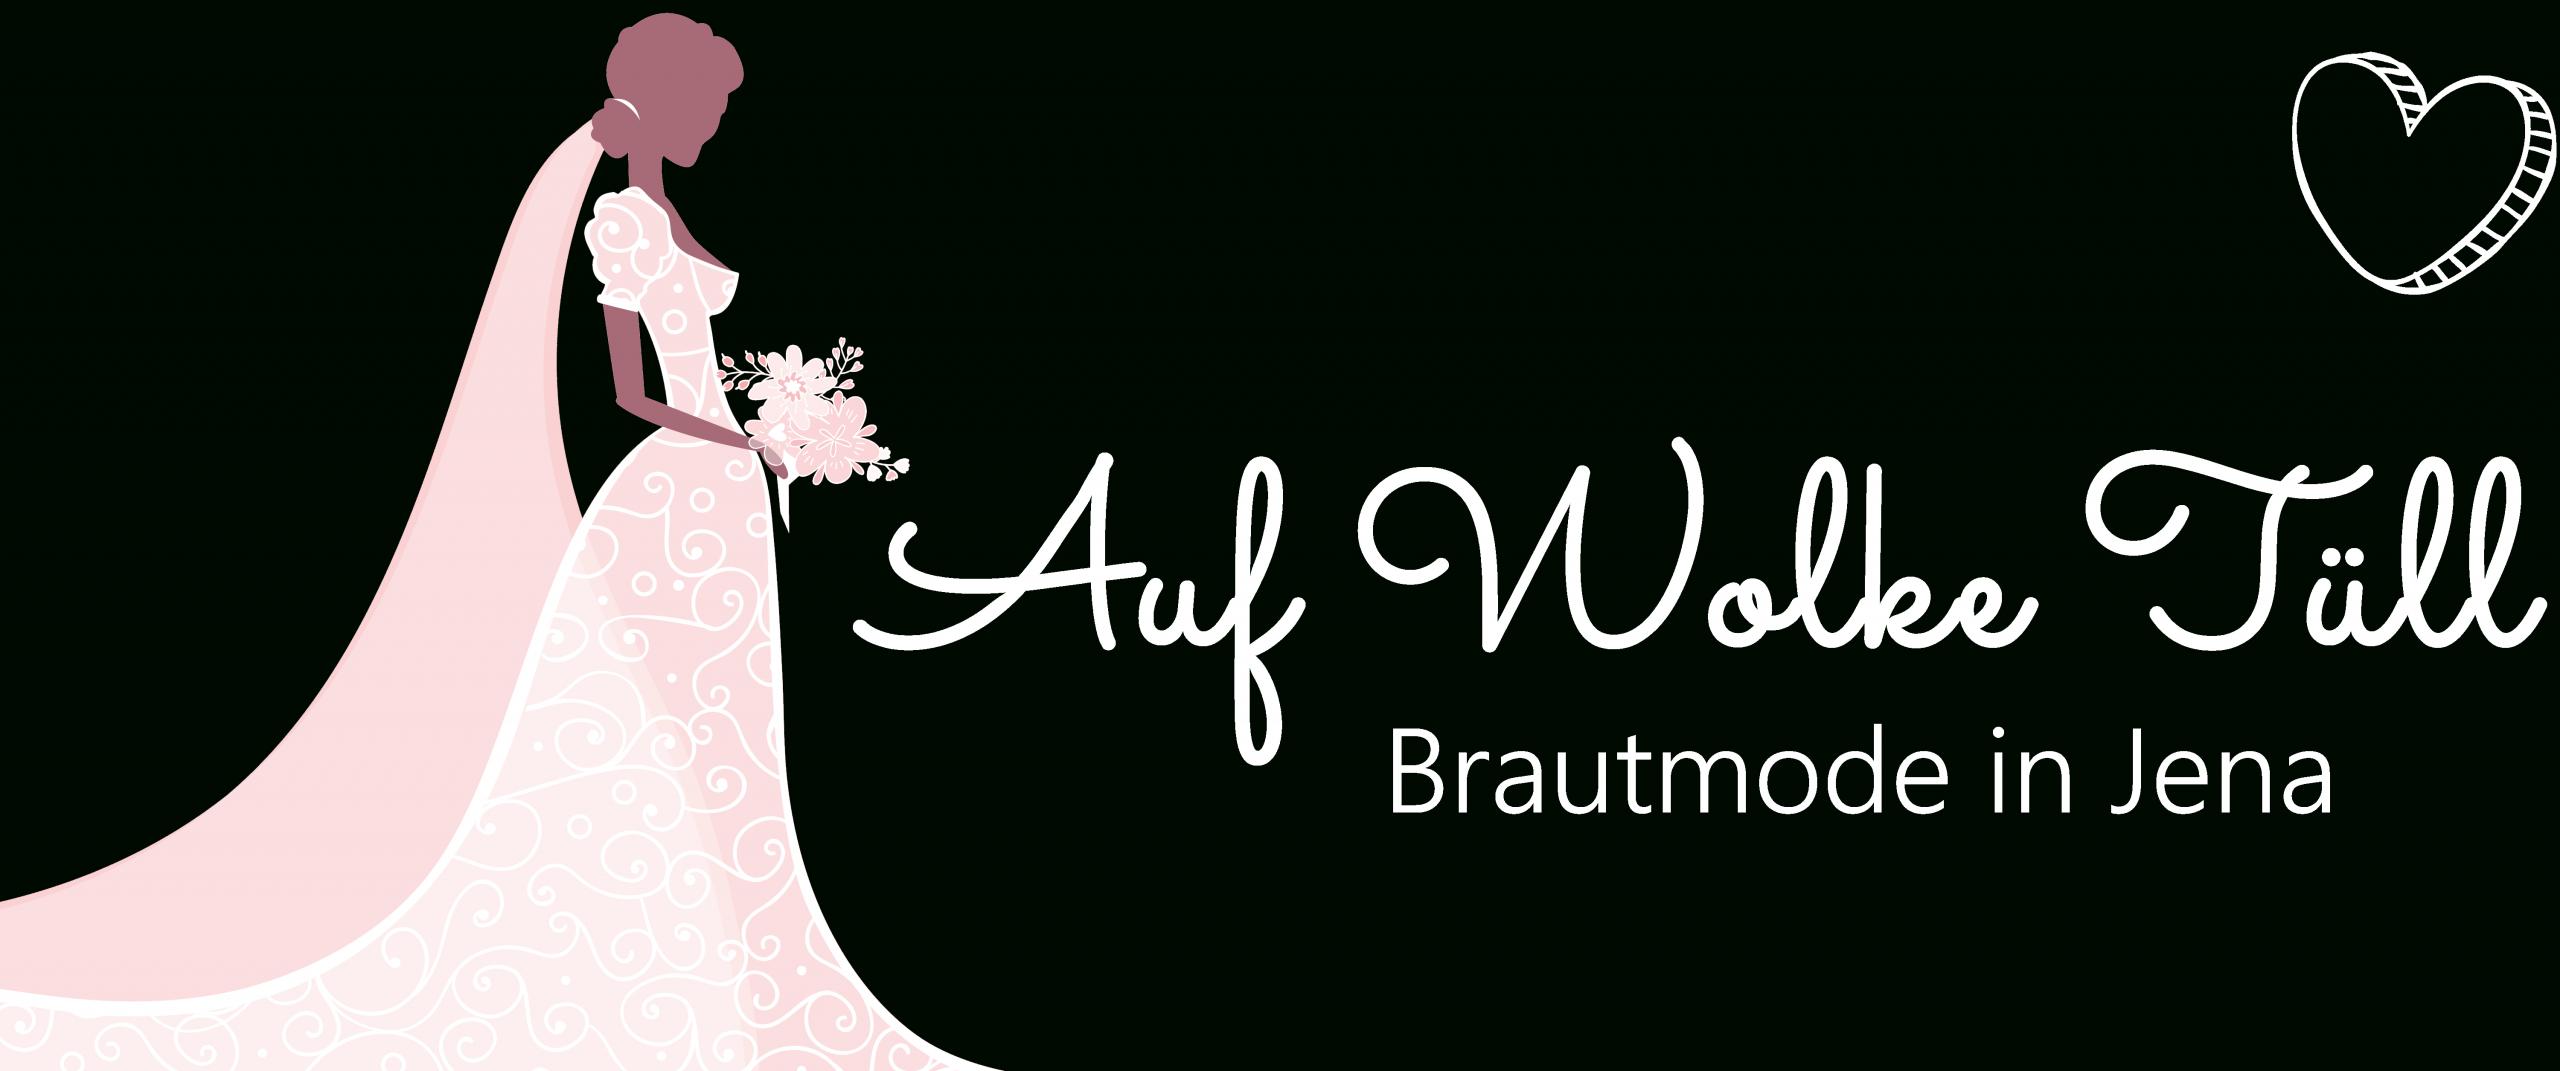 Start - Auf Wolke Tüll - Brautmode In Jena